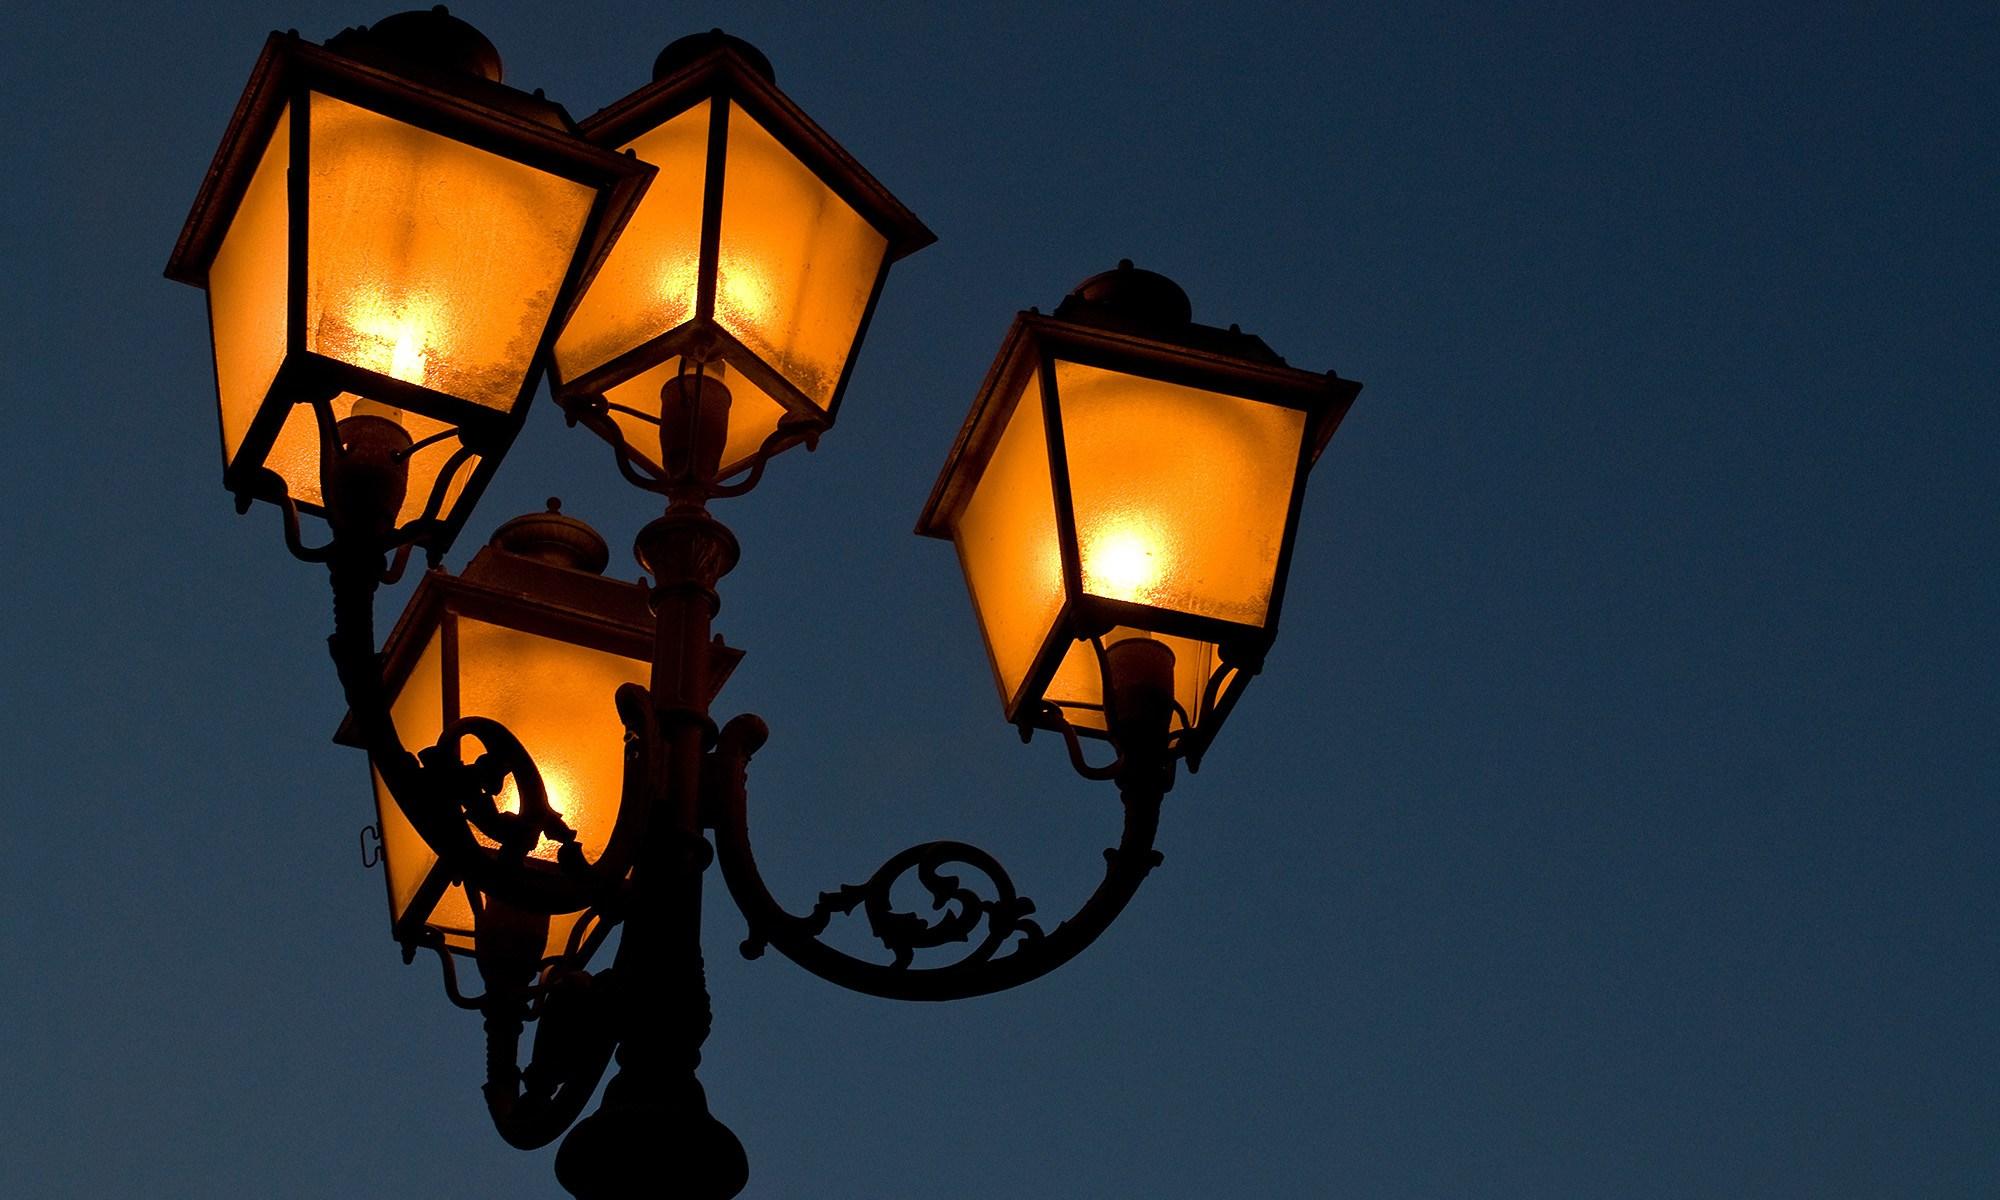 Street Lamp, Cagliari, Sardinia, Italy